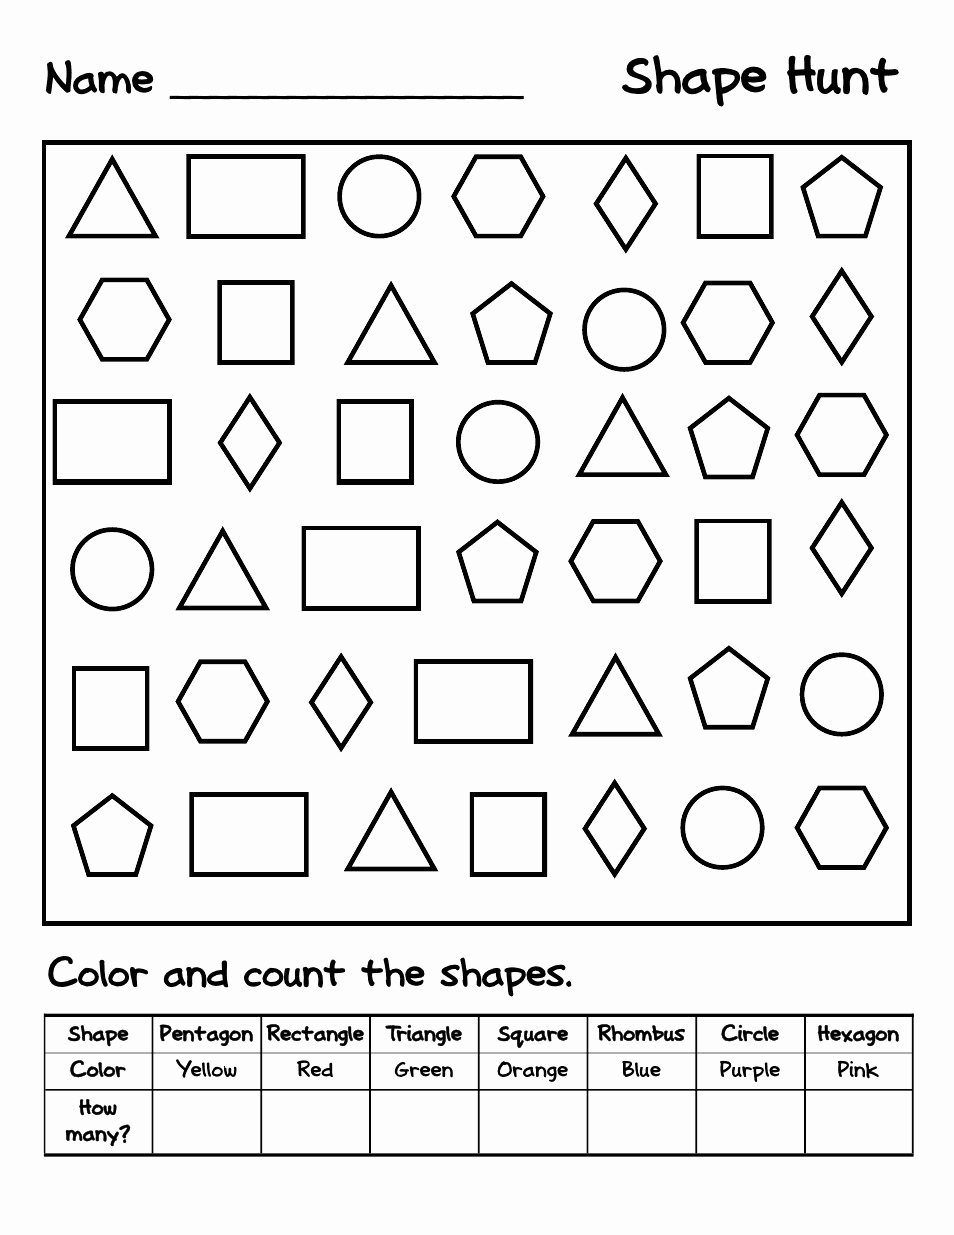 Identify Shapes Worksheet Kindergarten Luxury Shape Hunt Pdf Google Drive